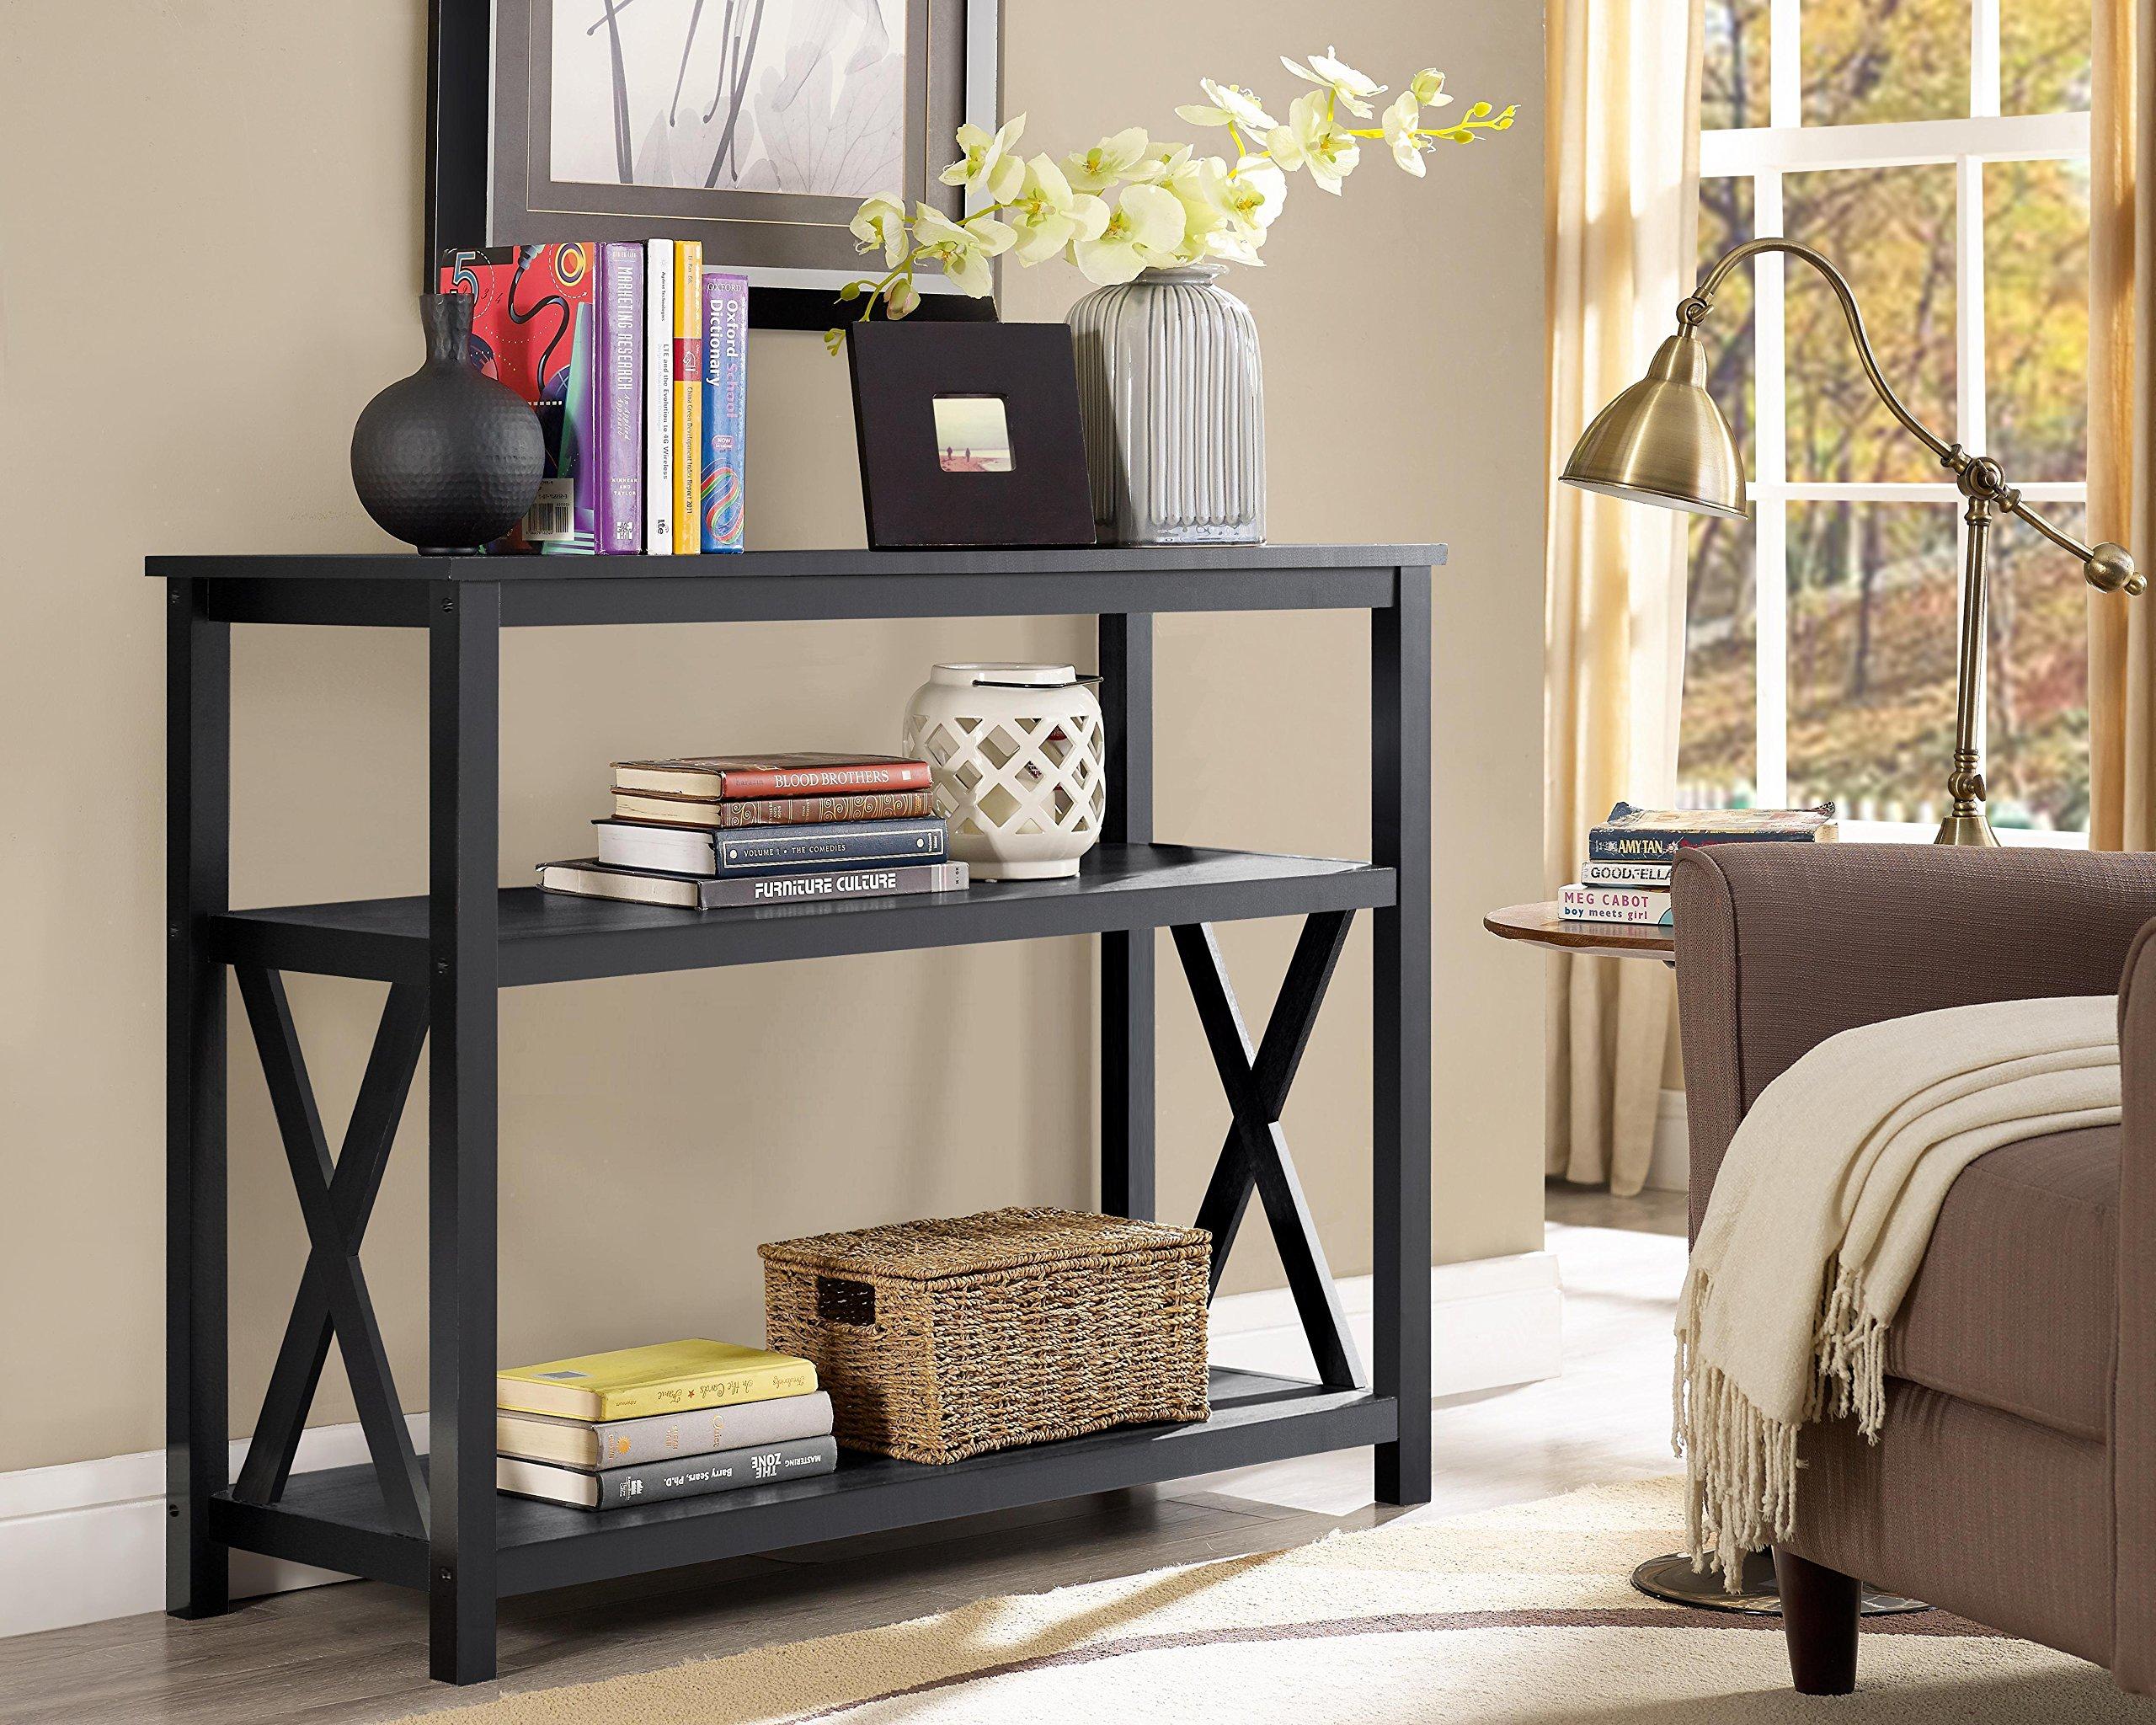 Black 2-Tier Occasional Console Sofa Table Bookshelf